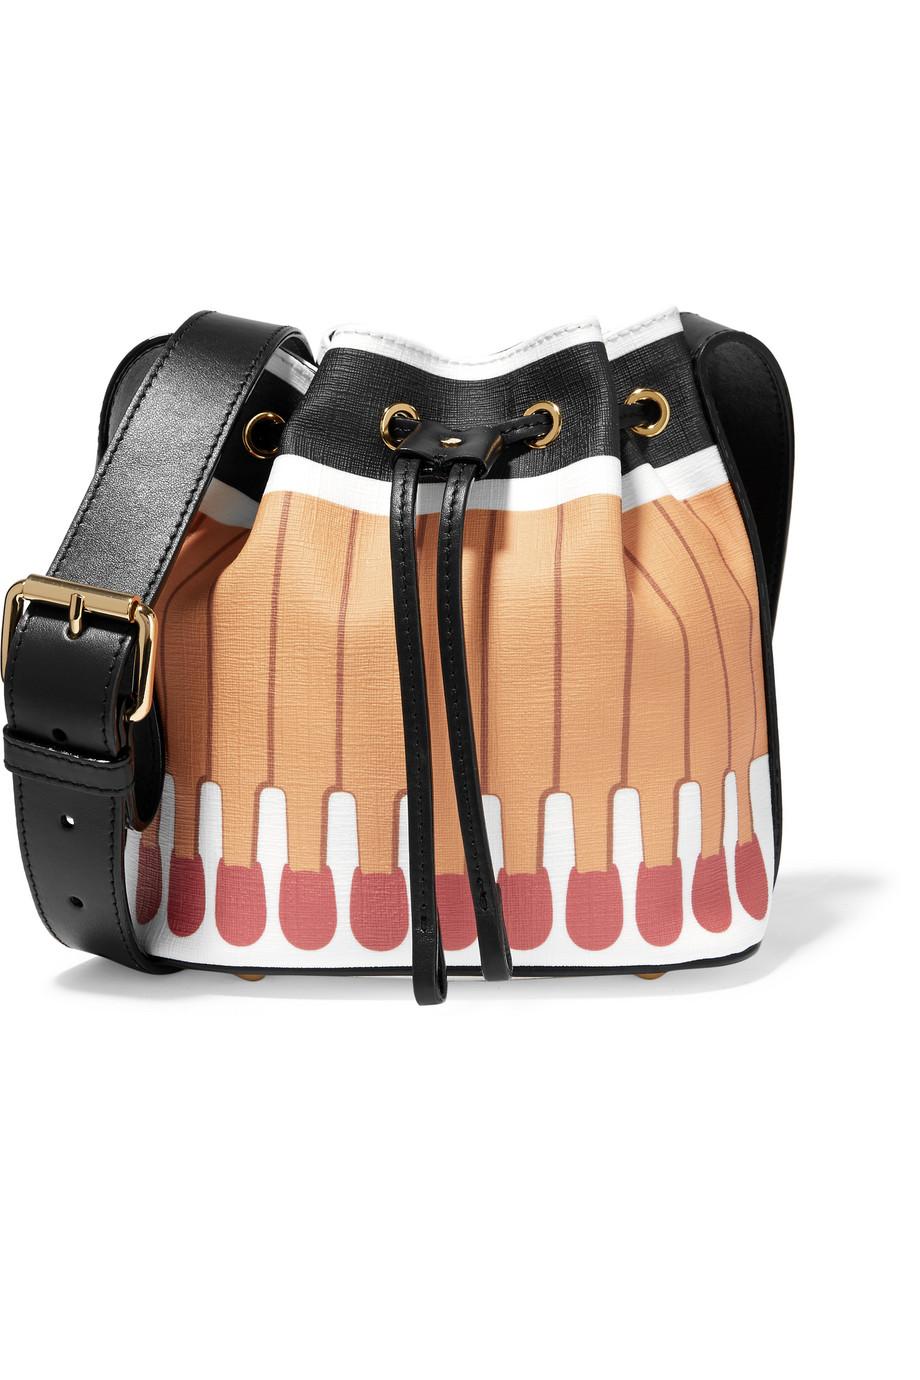 Moschino Printed Textured-PVC Bucket Bag, Beige, Women's